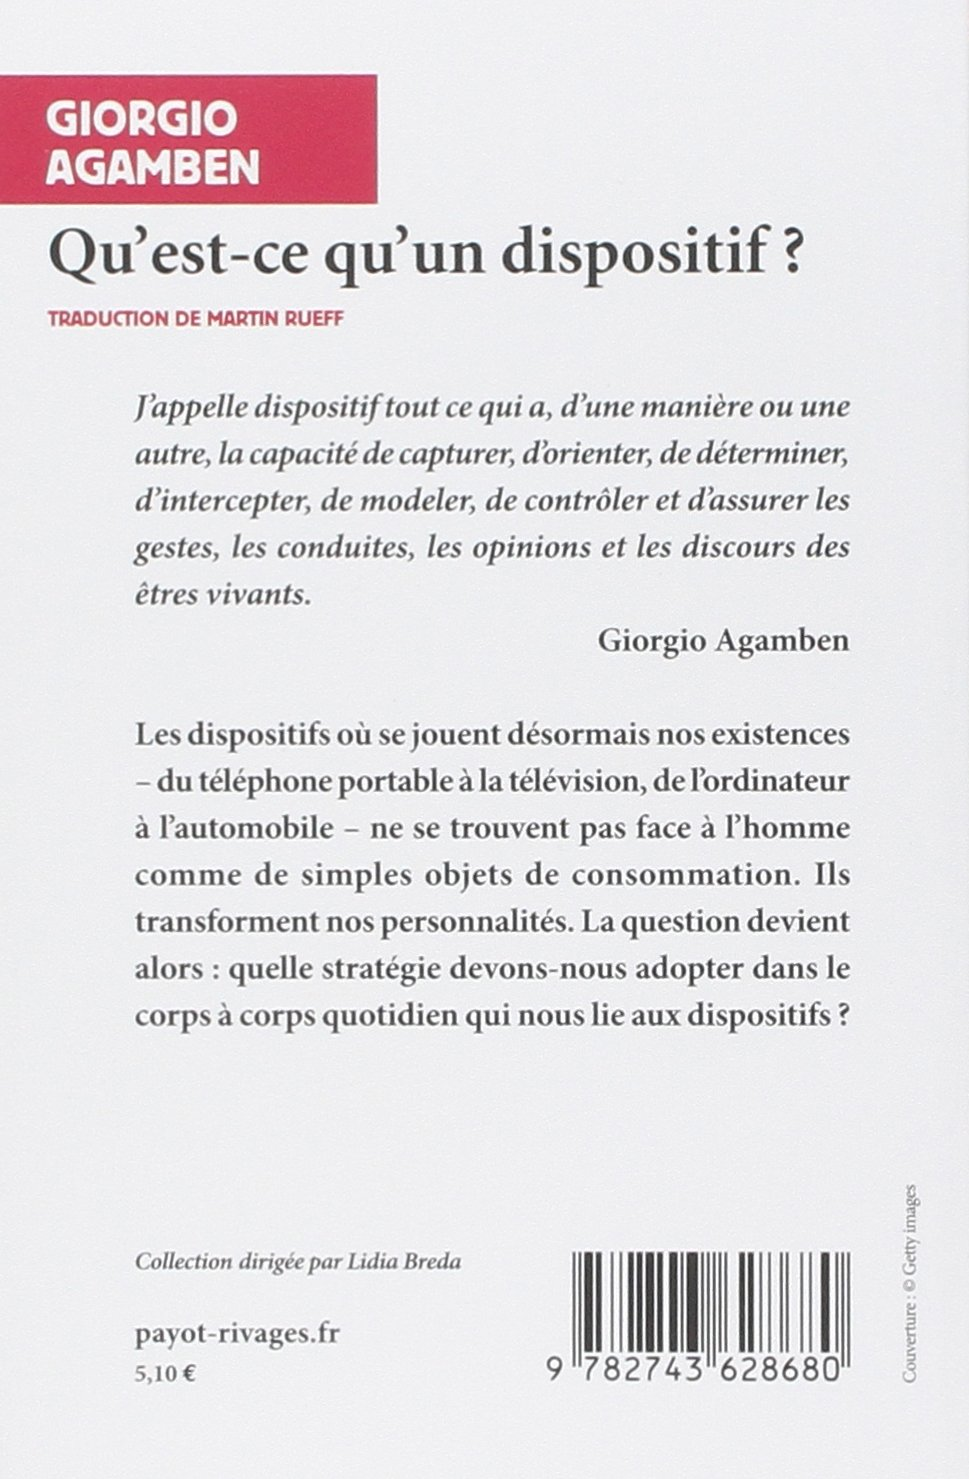 giorgio agamben qu est ce qu un dispositif pdf